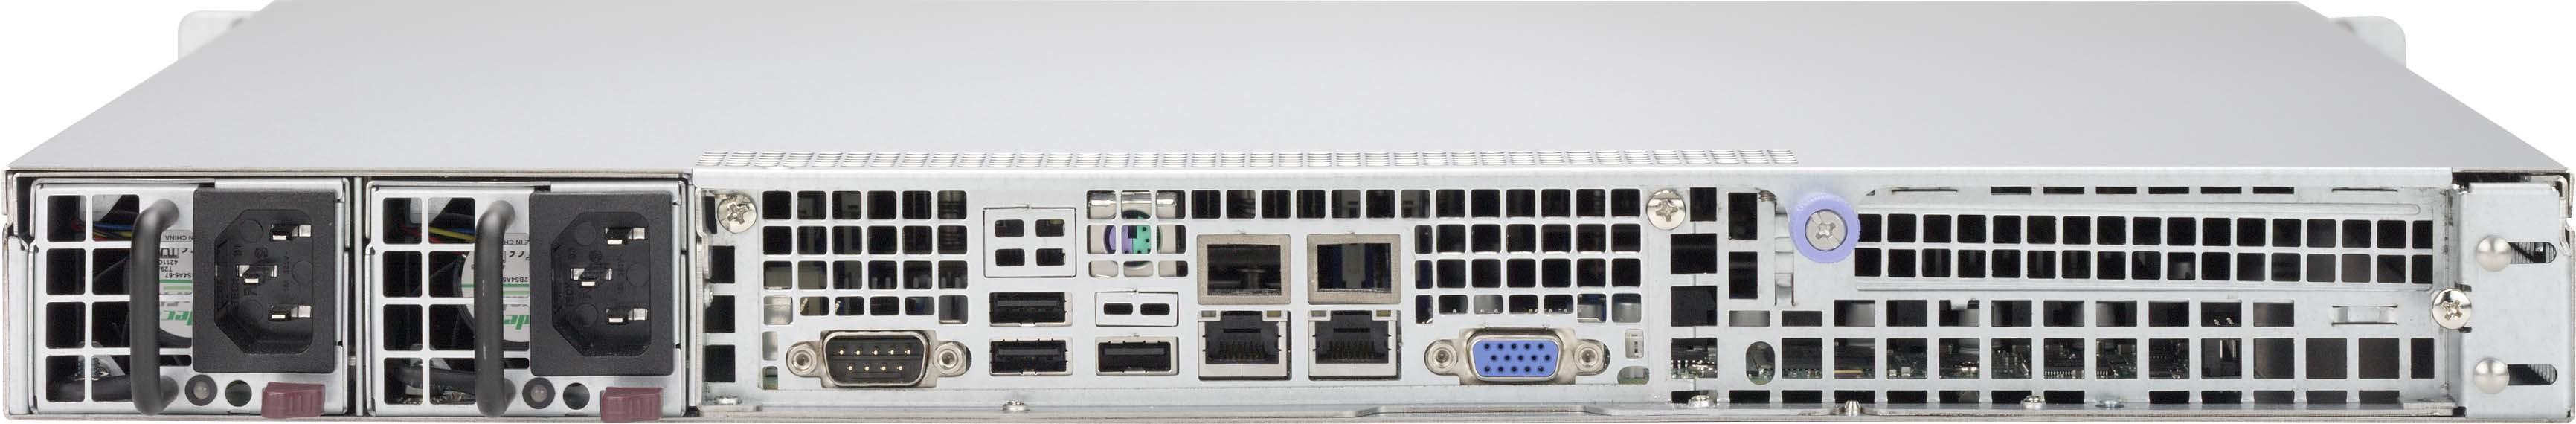 Supermicro 514-R400C computerbehuizing Rack Black 400 W